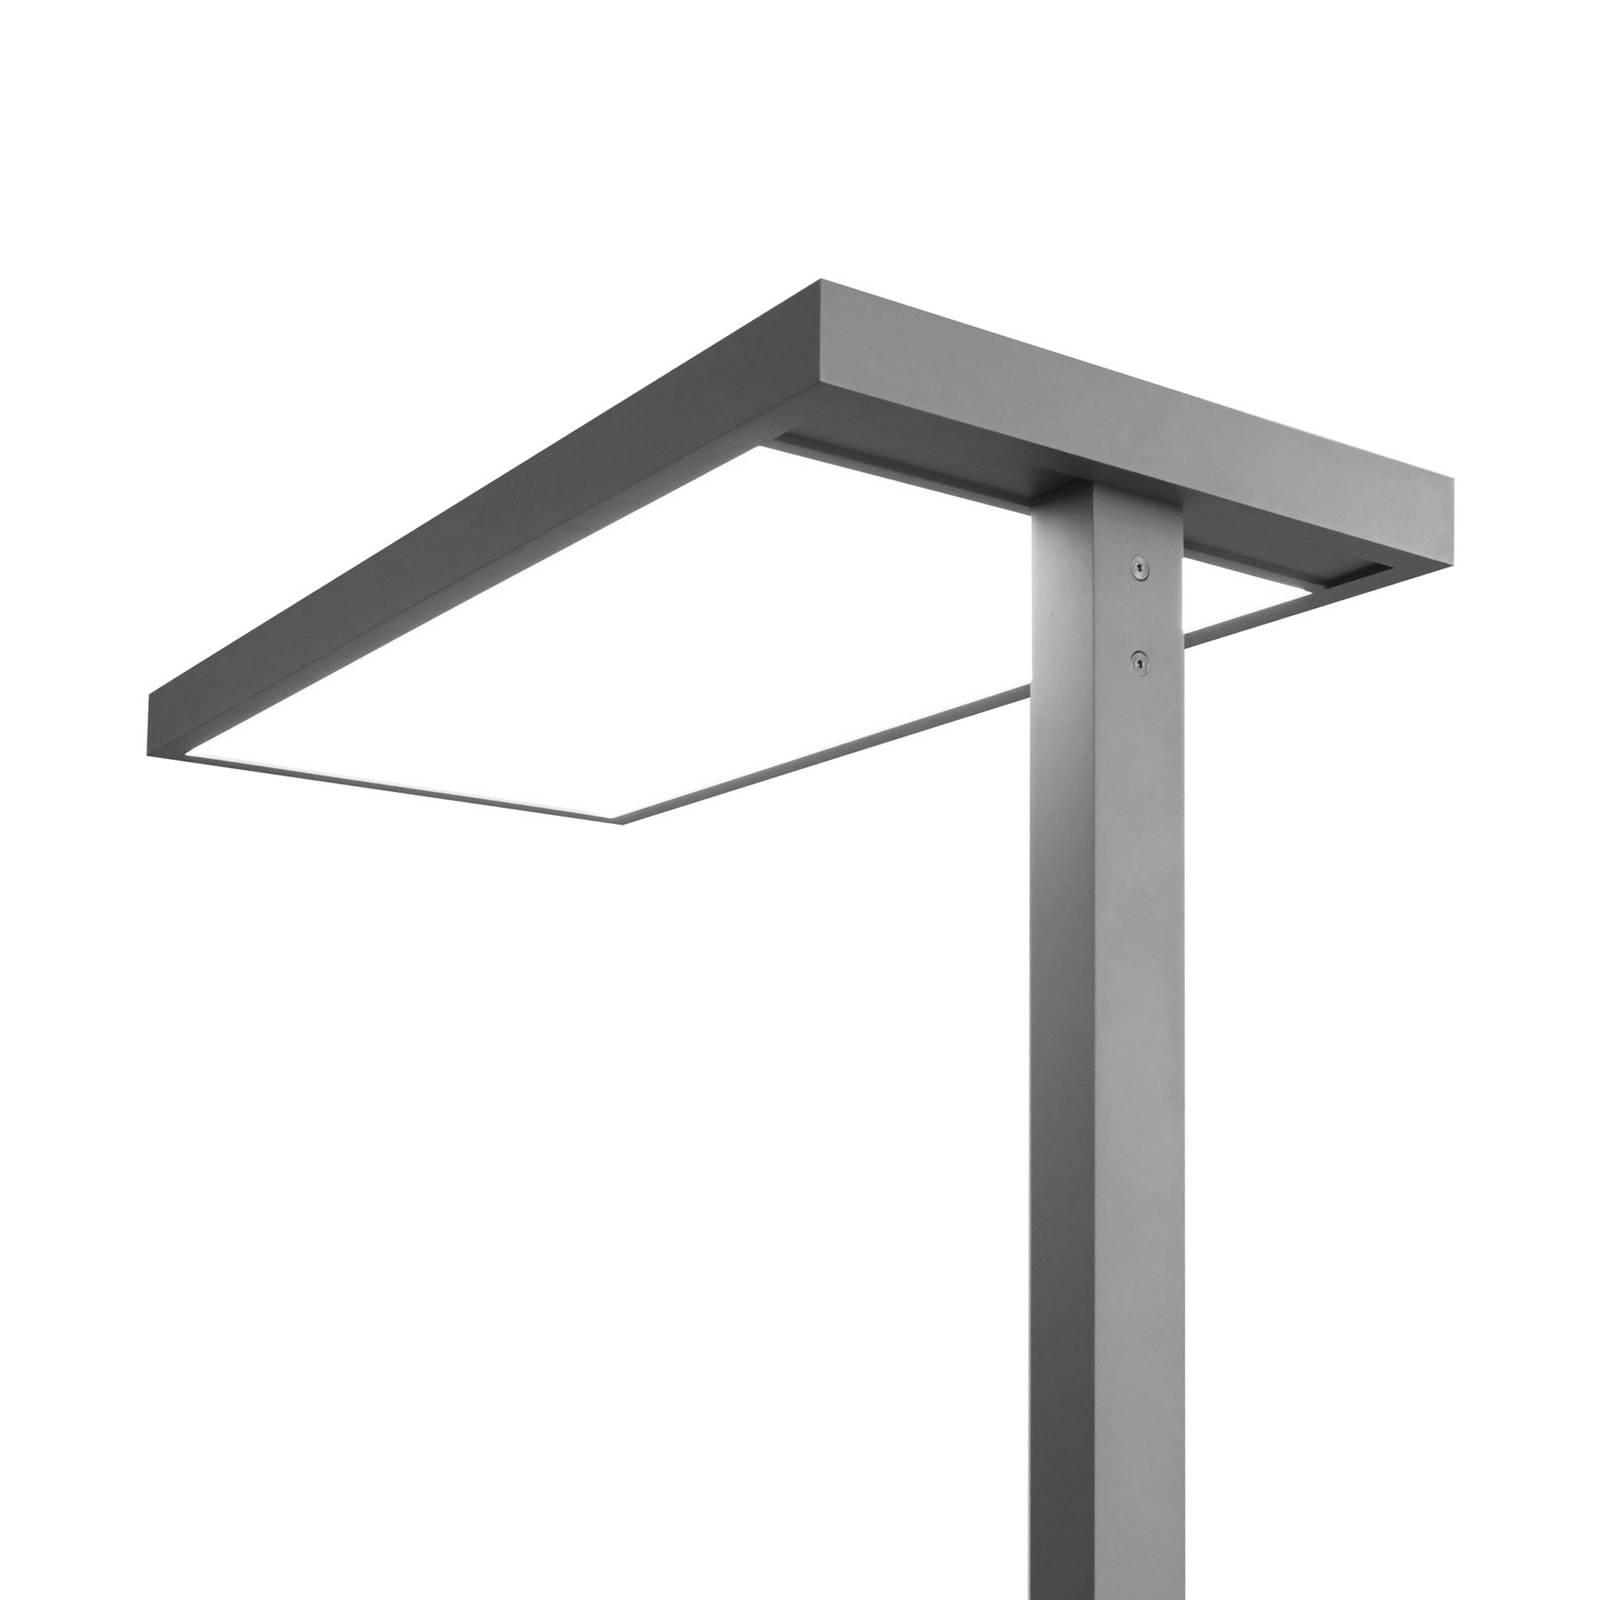 Lampa stojąca biurowa LED Somidia, srebrna